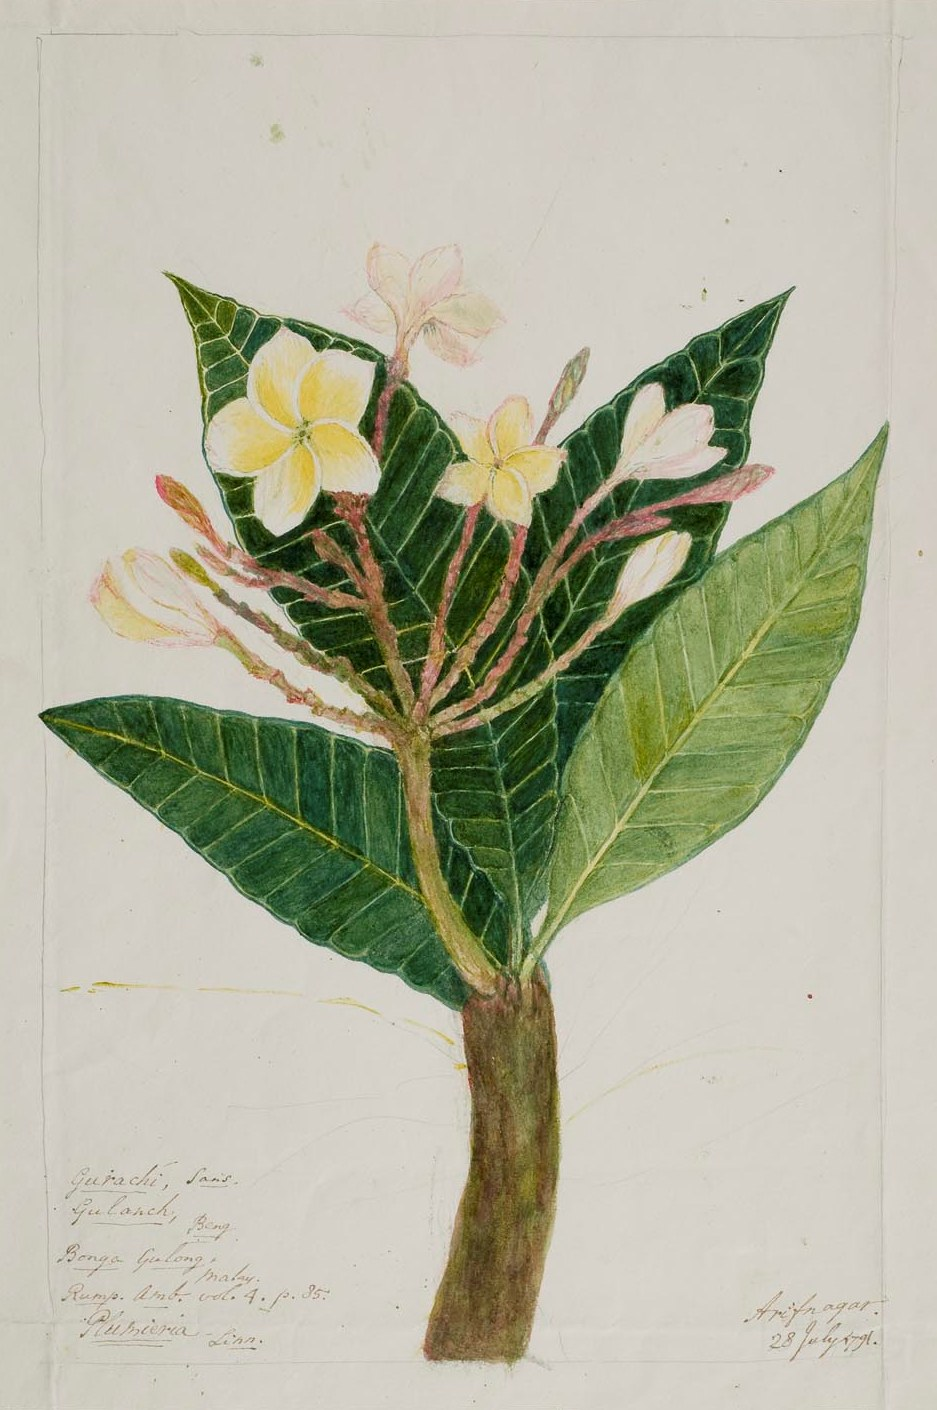 Frangipani Tree Drawing The Frangipani Plant